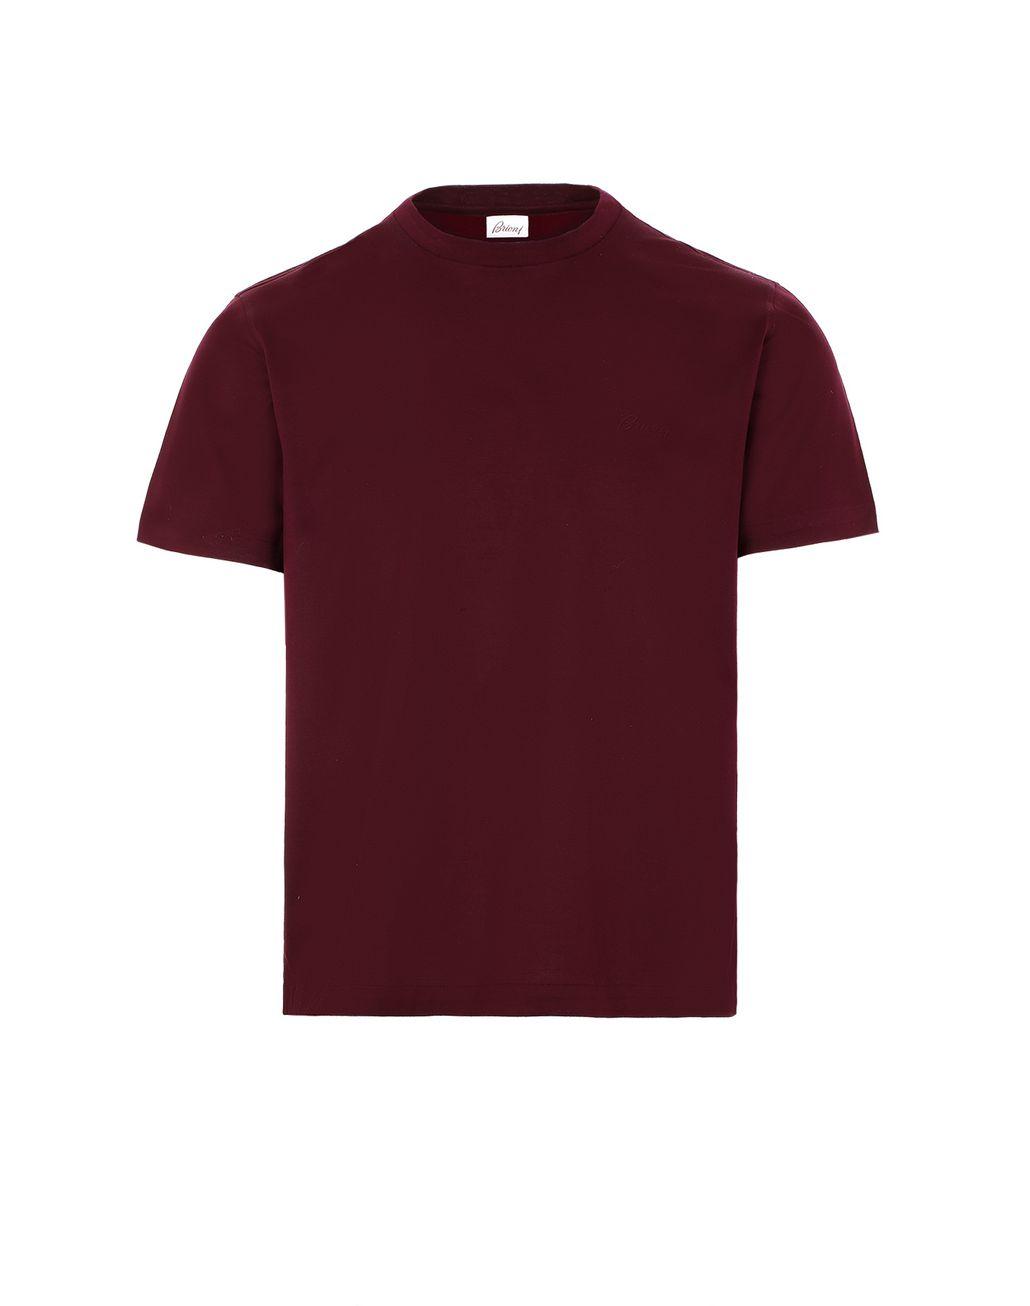 BRIONI Bordeaux Crewneck T-Shirt. T-Shirts & Polos Man f